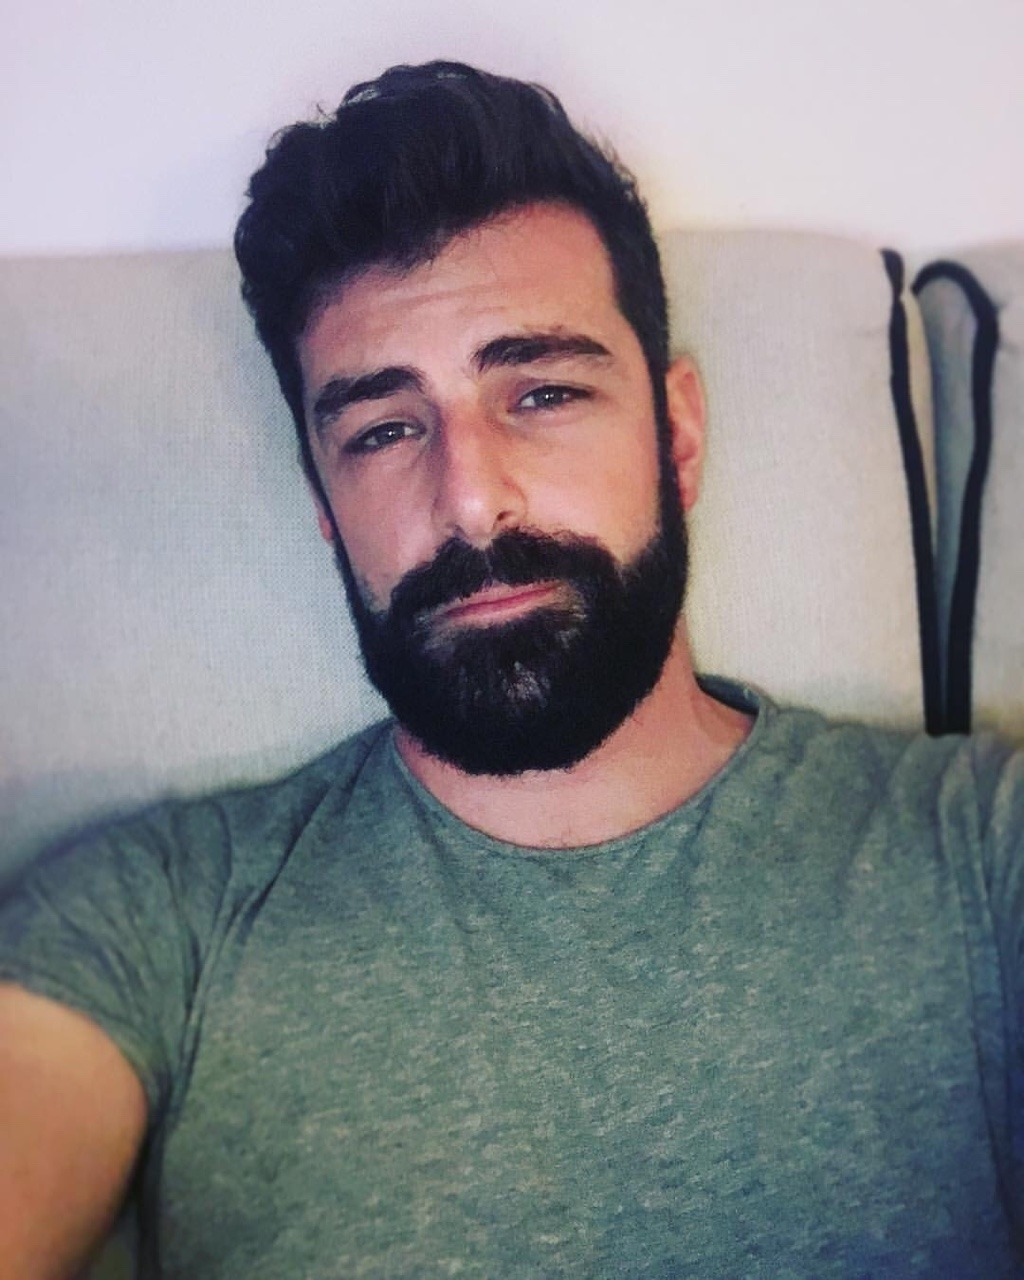 2019-01-05 10:12:52 - nonxo instagram beardburnme http://www.neofic.com